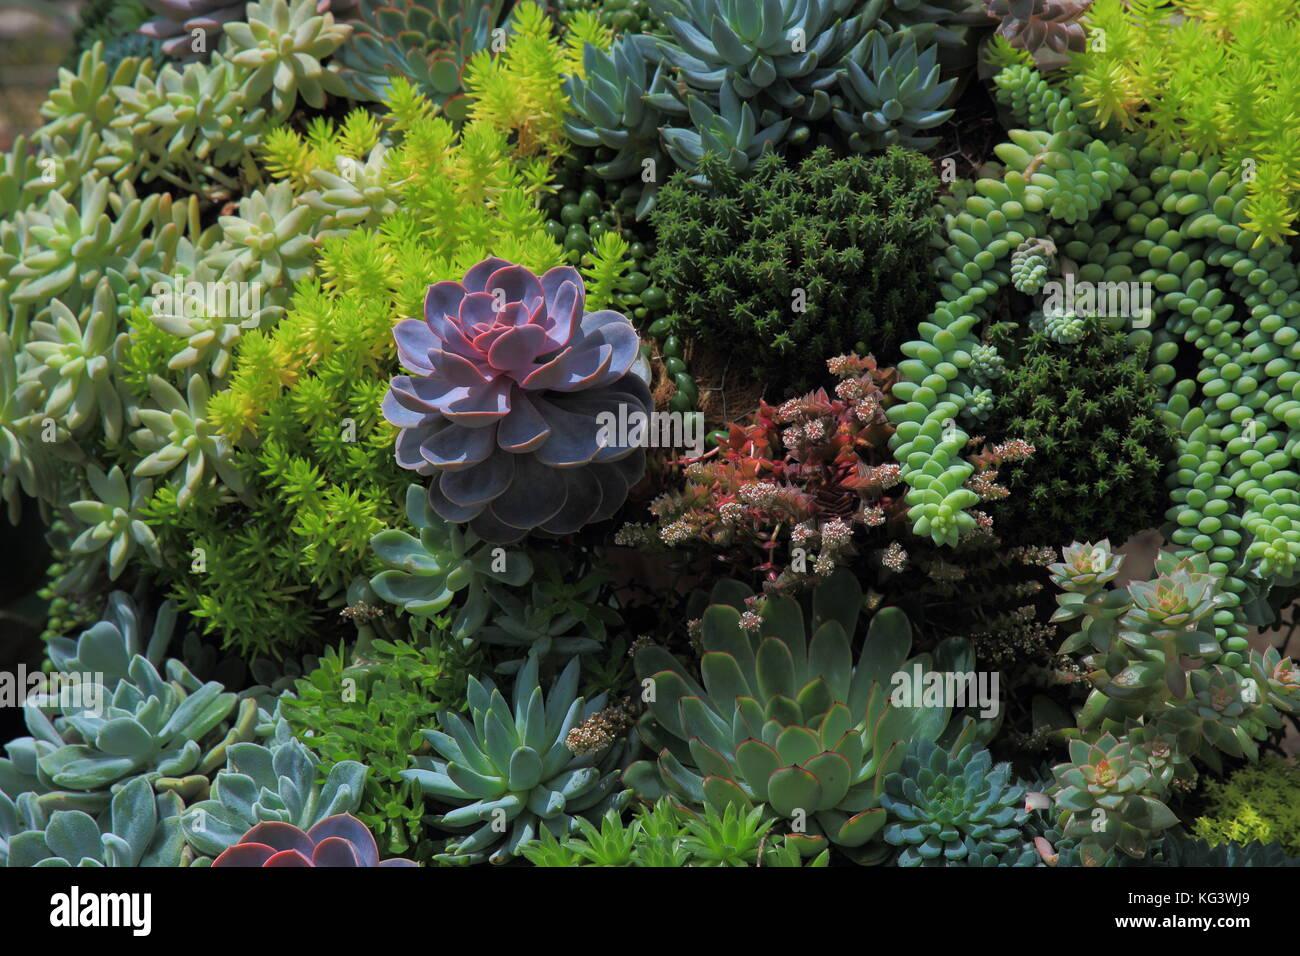 Miniature Garden With Purple Succulent Plant Among Lush Green Plant Stock Photo Alamy